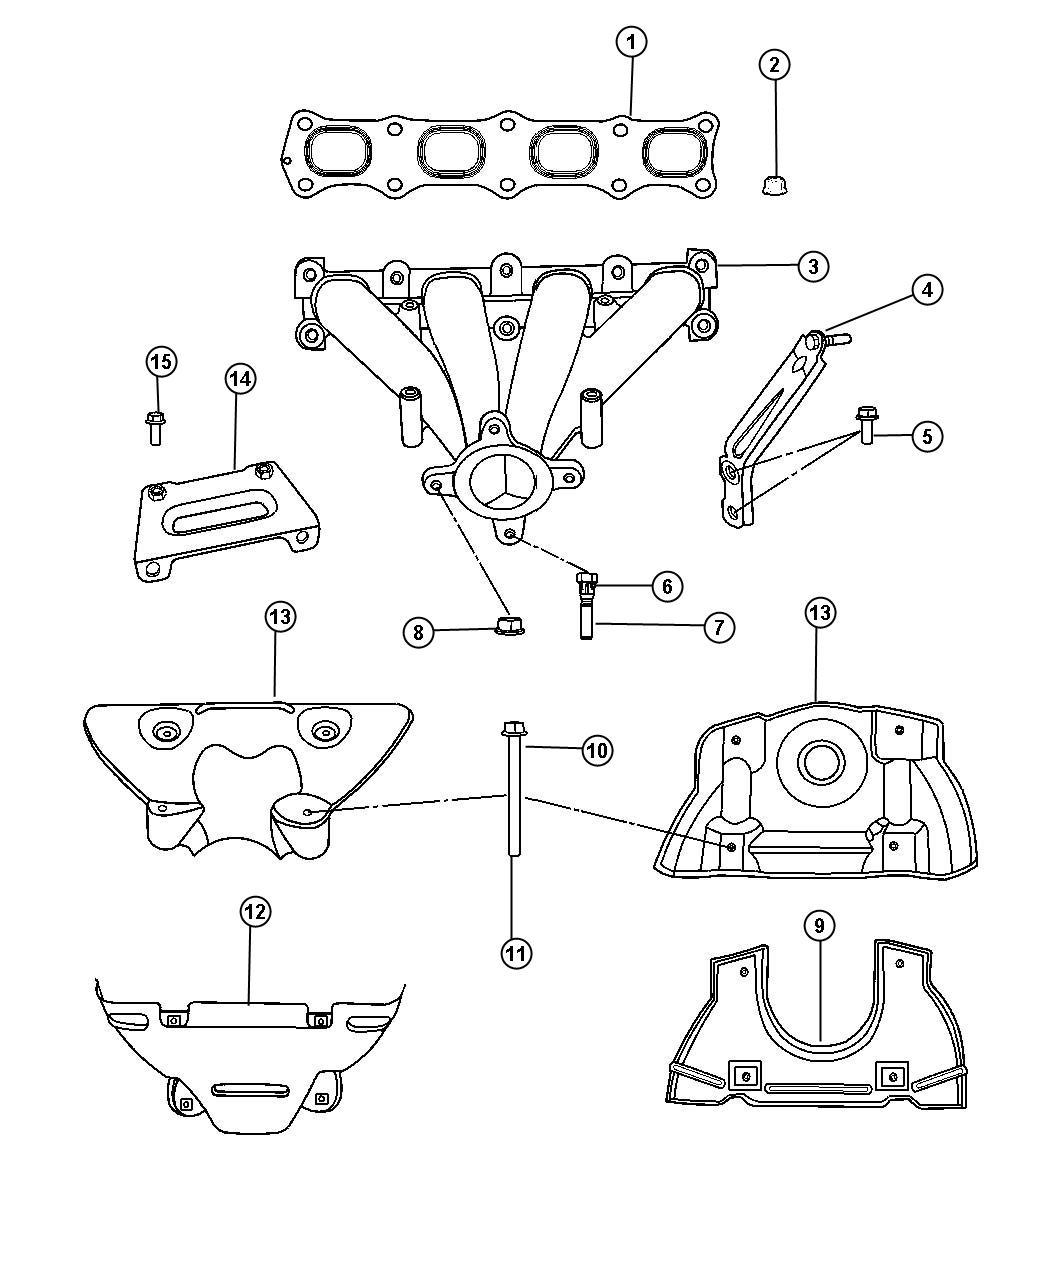 Jeep Patriot Shield. Exhaust manifold, heat. Lower. 4wd